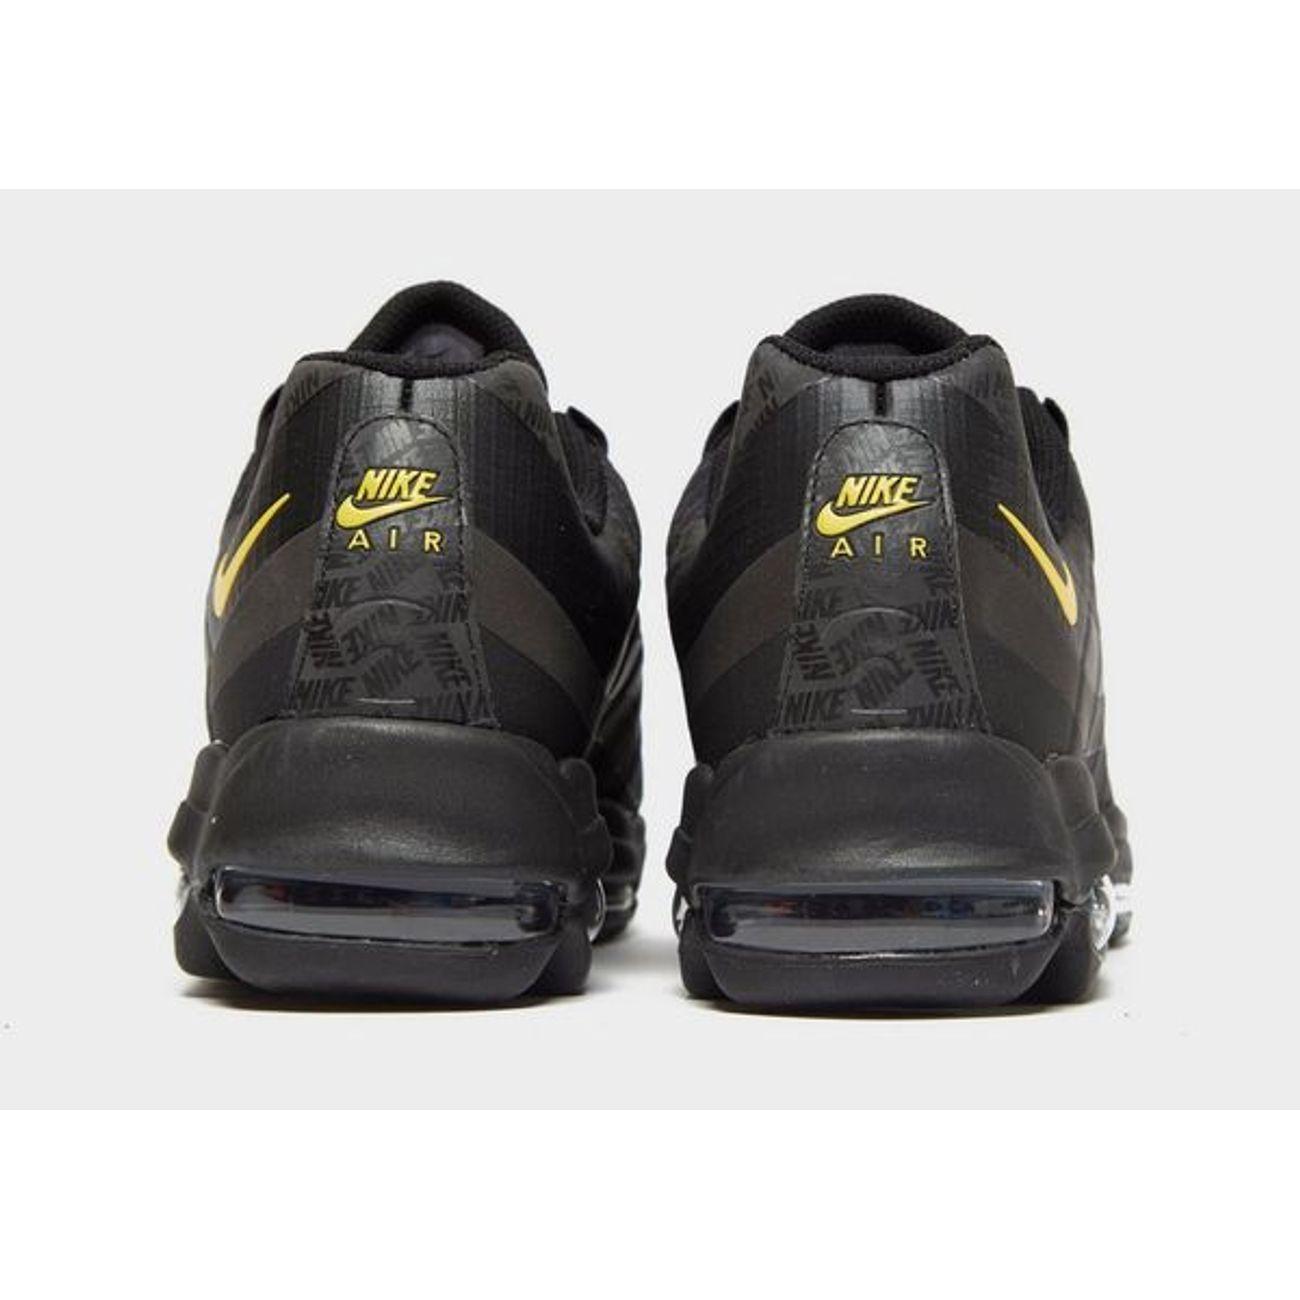 Nike Homme Air Max 95 Ultra LUzVpGqSM